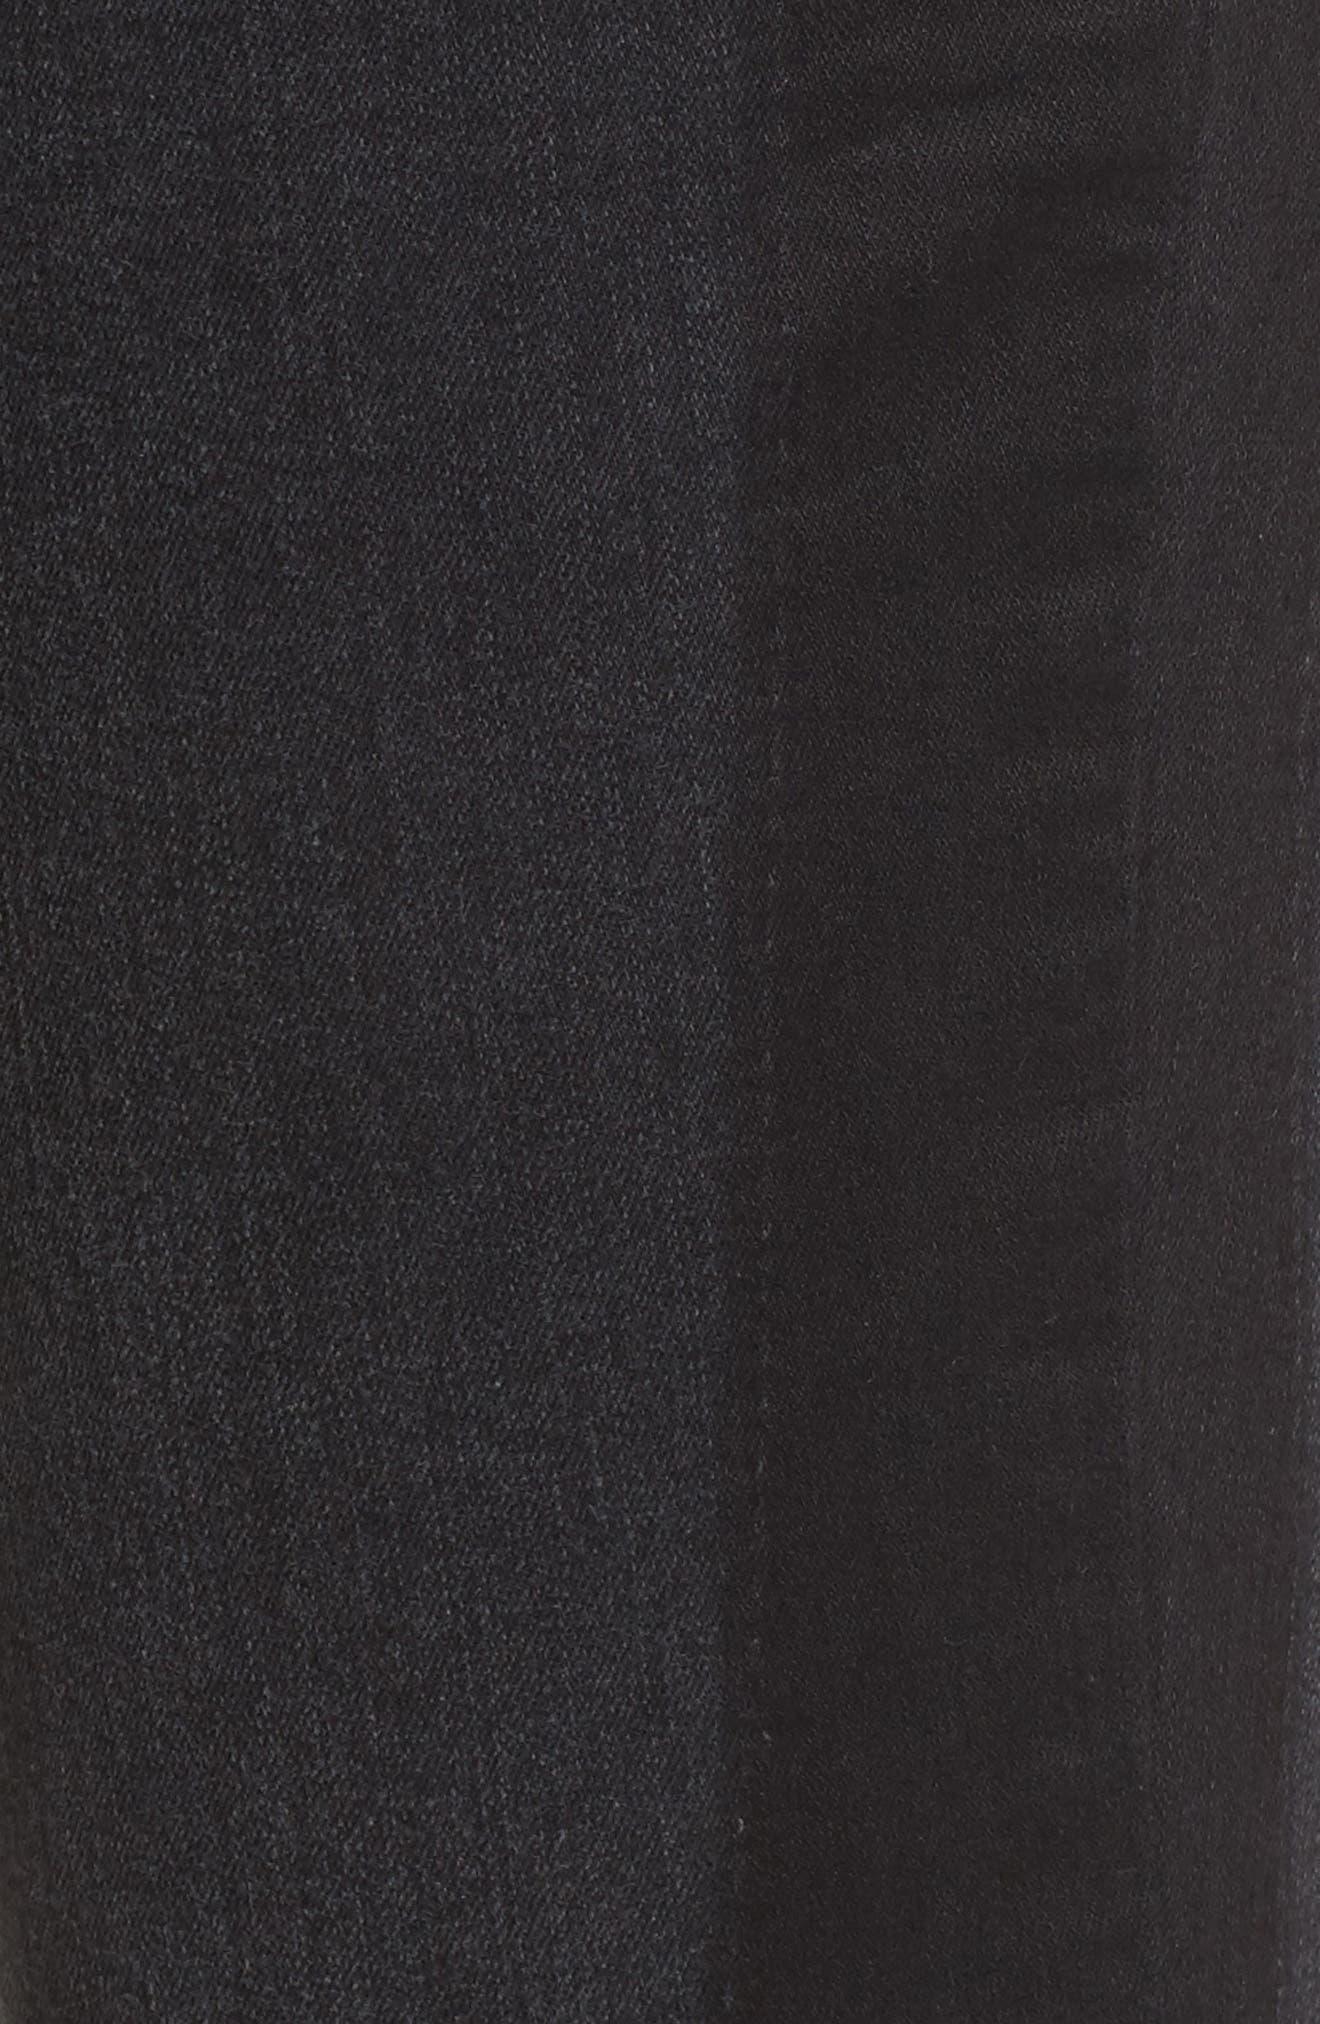 Alternate Image 5  - Wit & Wisdom Tuxedo Stripe Skinny Jeans (Nordstrom Exclusive) (Regular & Petite)